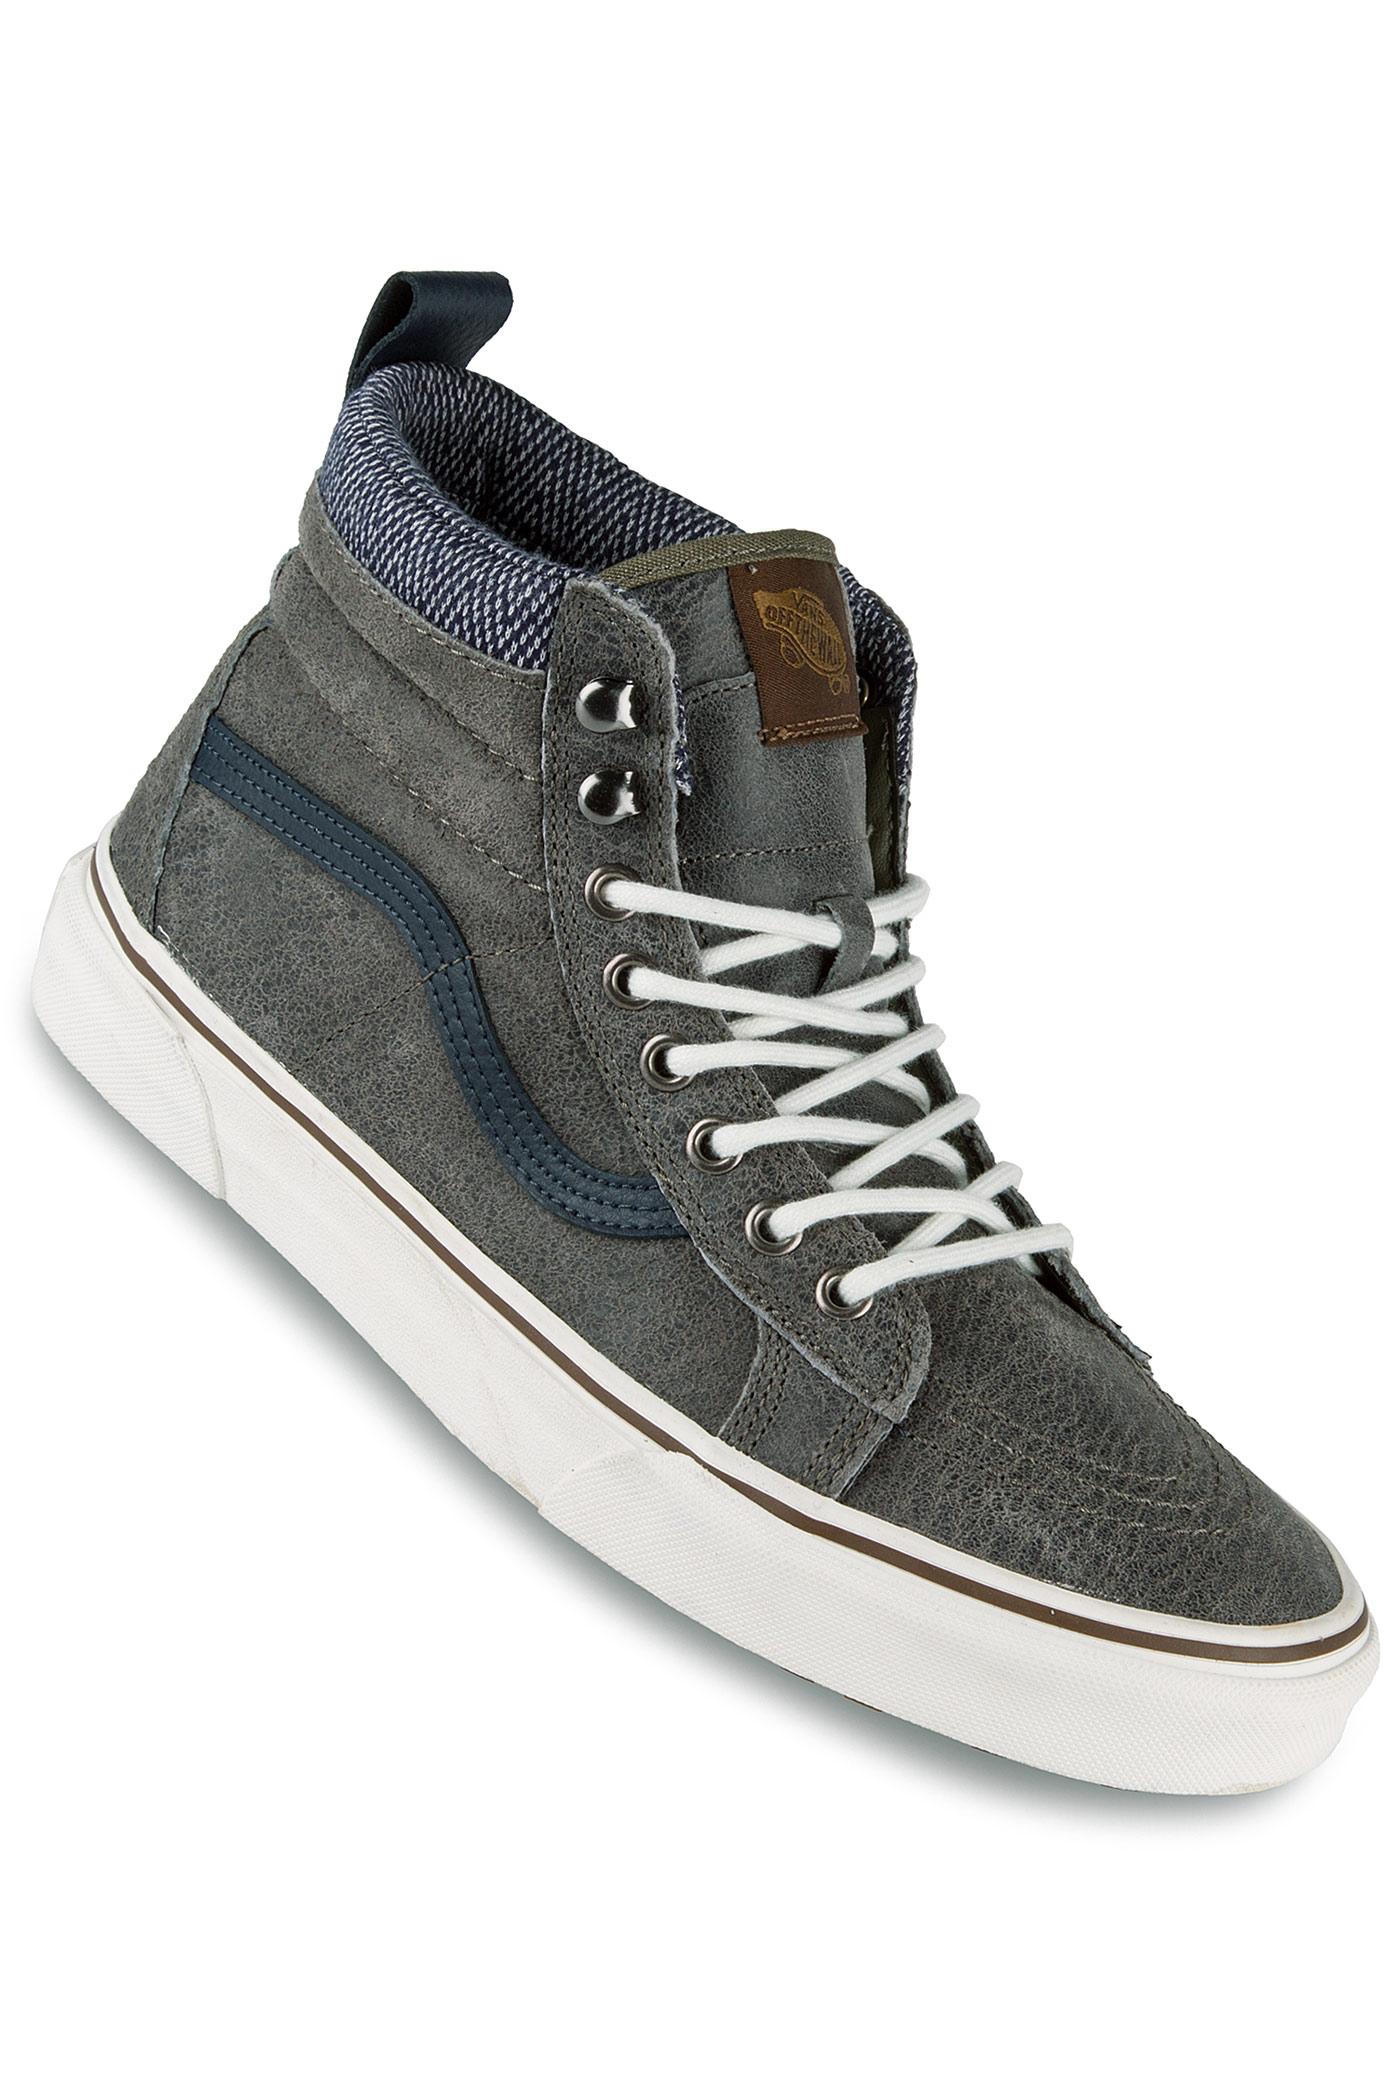 ead90783a6 Vans Sk8-Hi MTE Schuh (charcoal herringbone) kaufen bei .